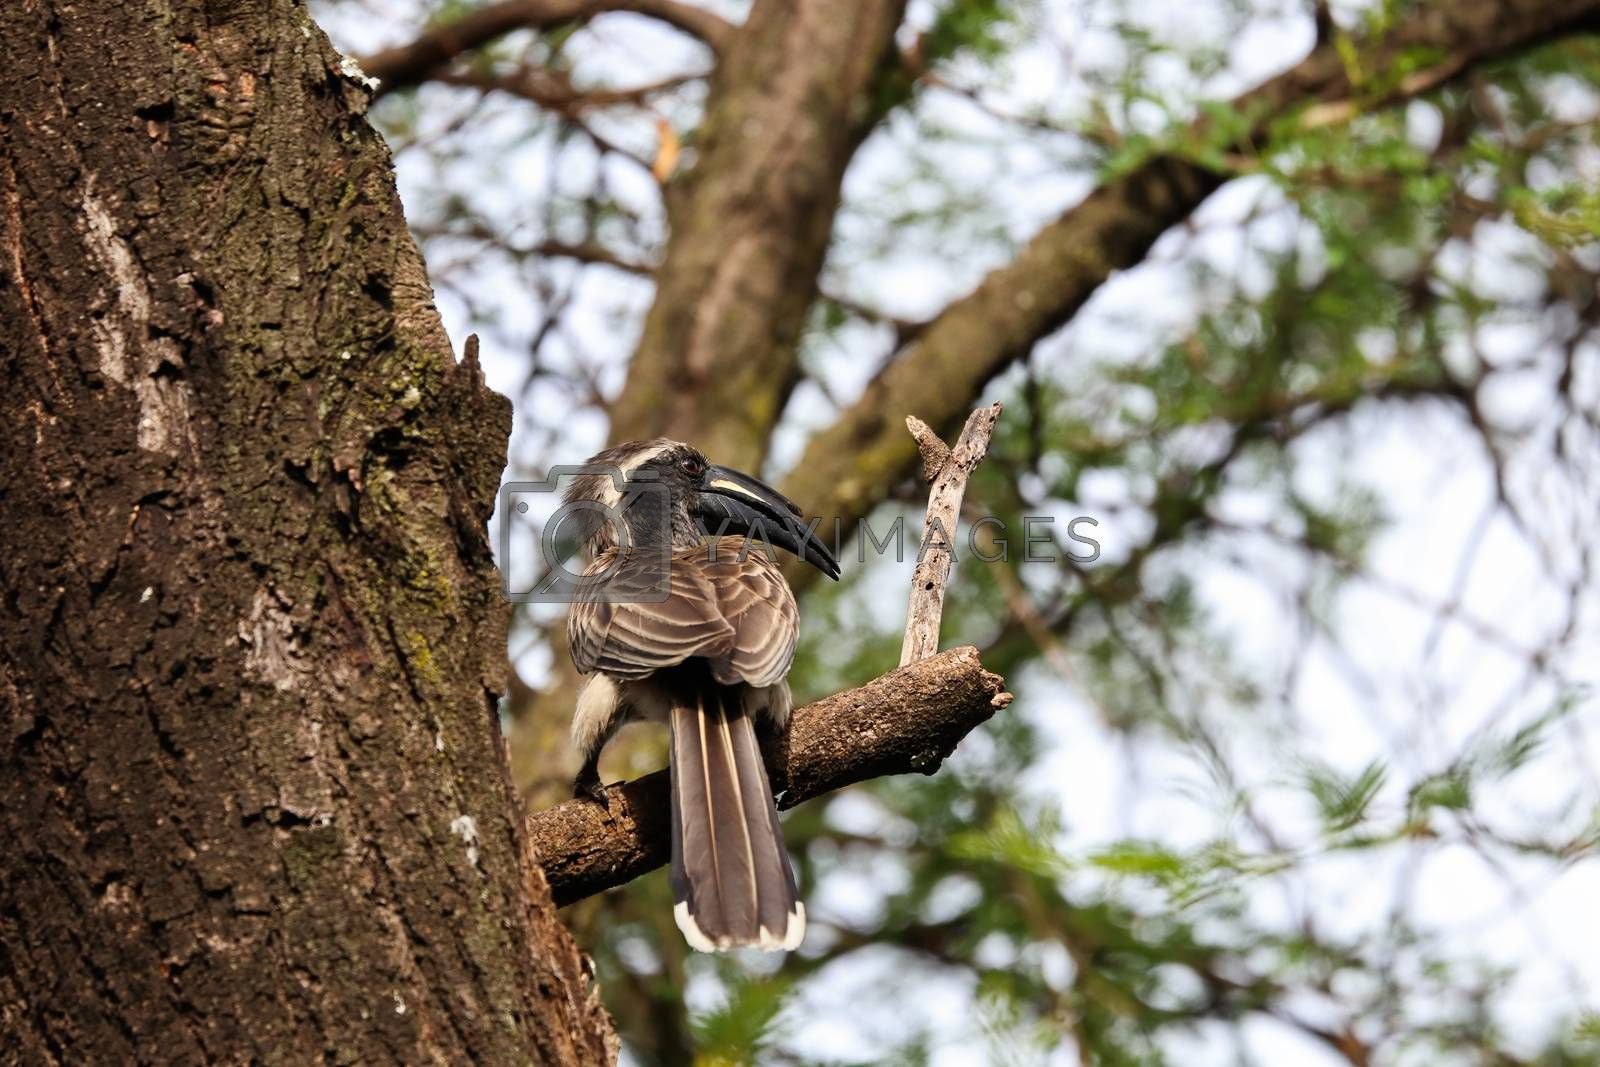 A male African grey hornbill bird (Lophoceros nasutus) perching on thorn tree branch near a hidden tree trunk nest, Pretoria, South Africa